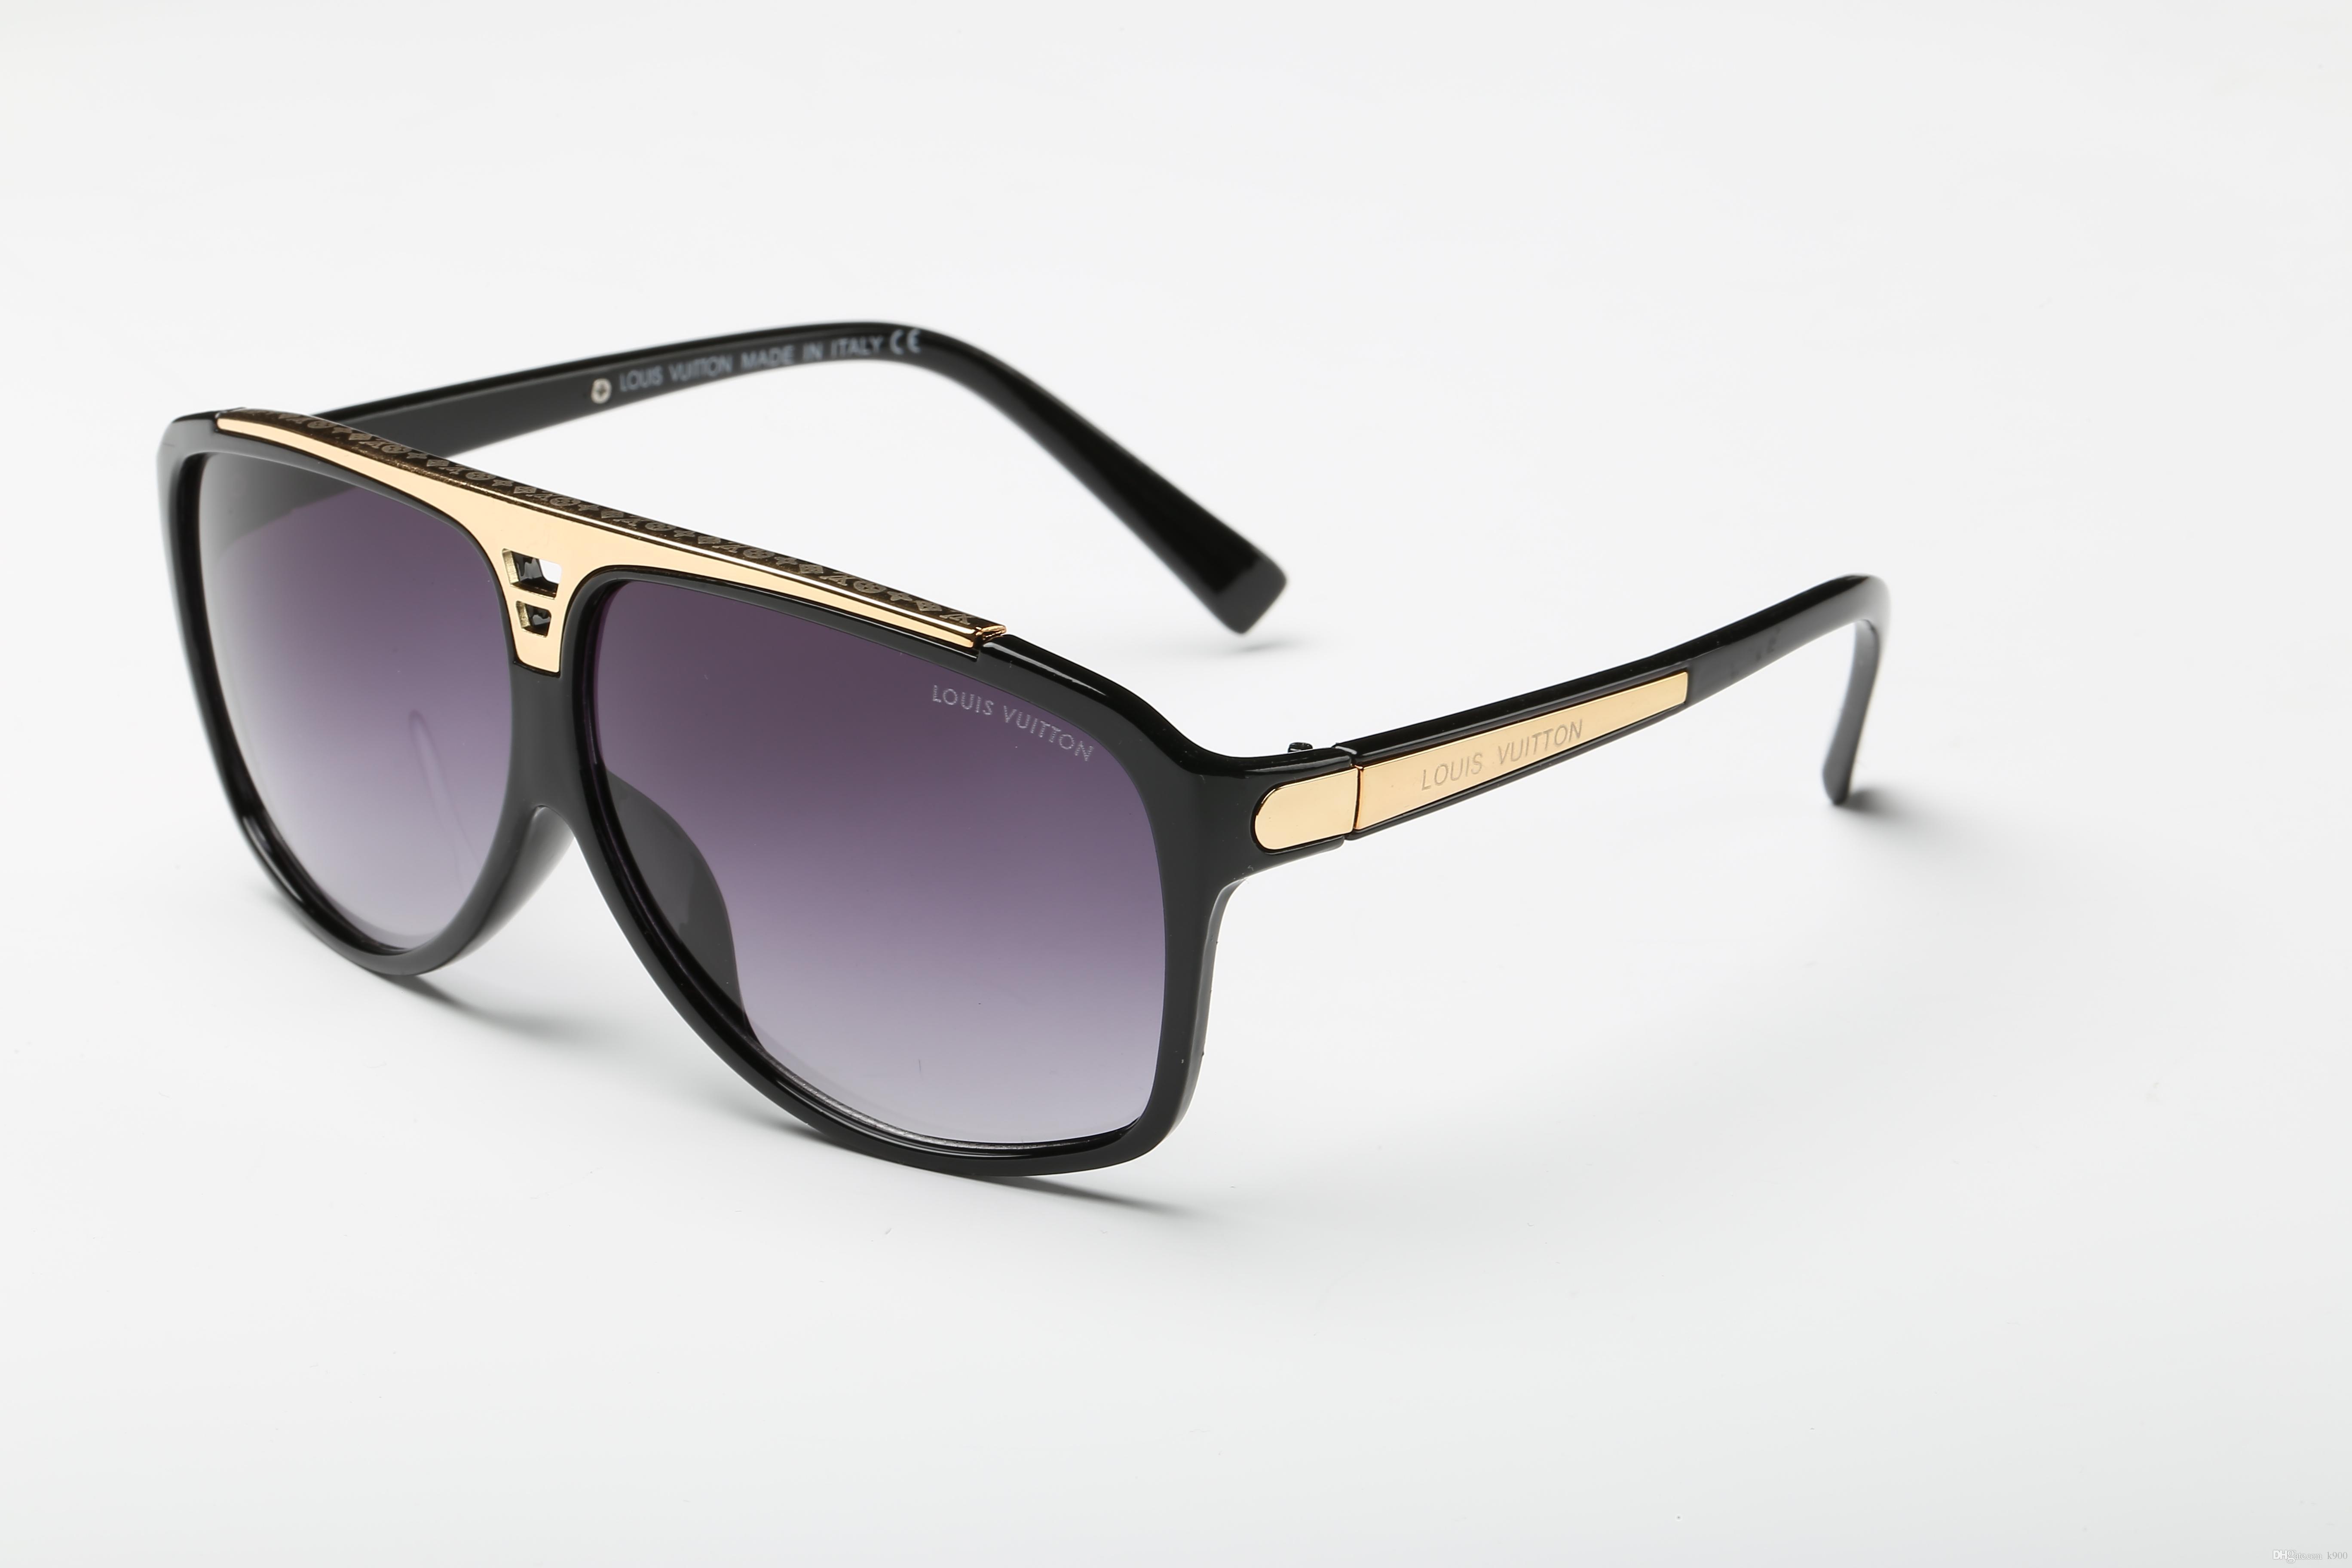 dfec4e0f42 2019 Hot Sell Luxury Sunglasses Designers Brand Luxury Z0350 ...